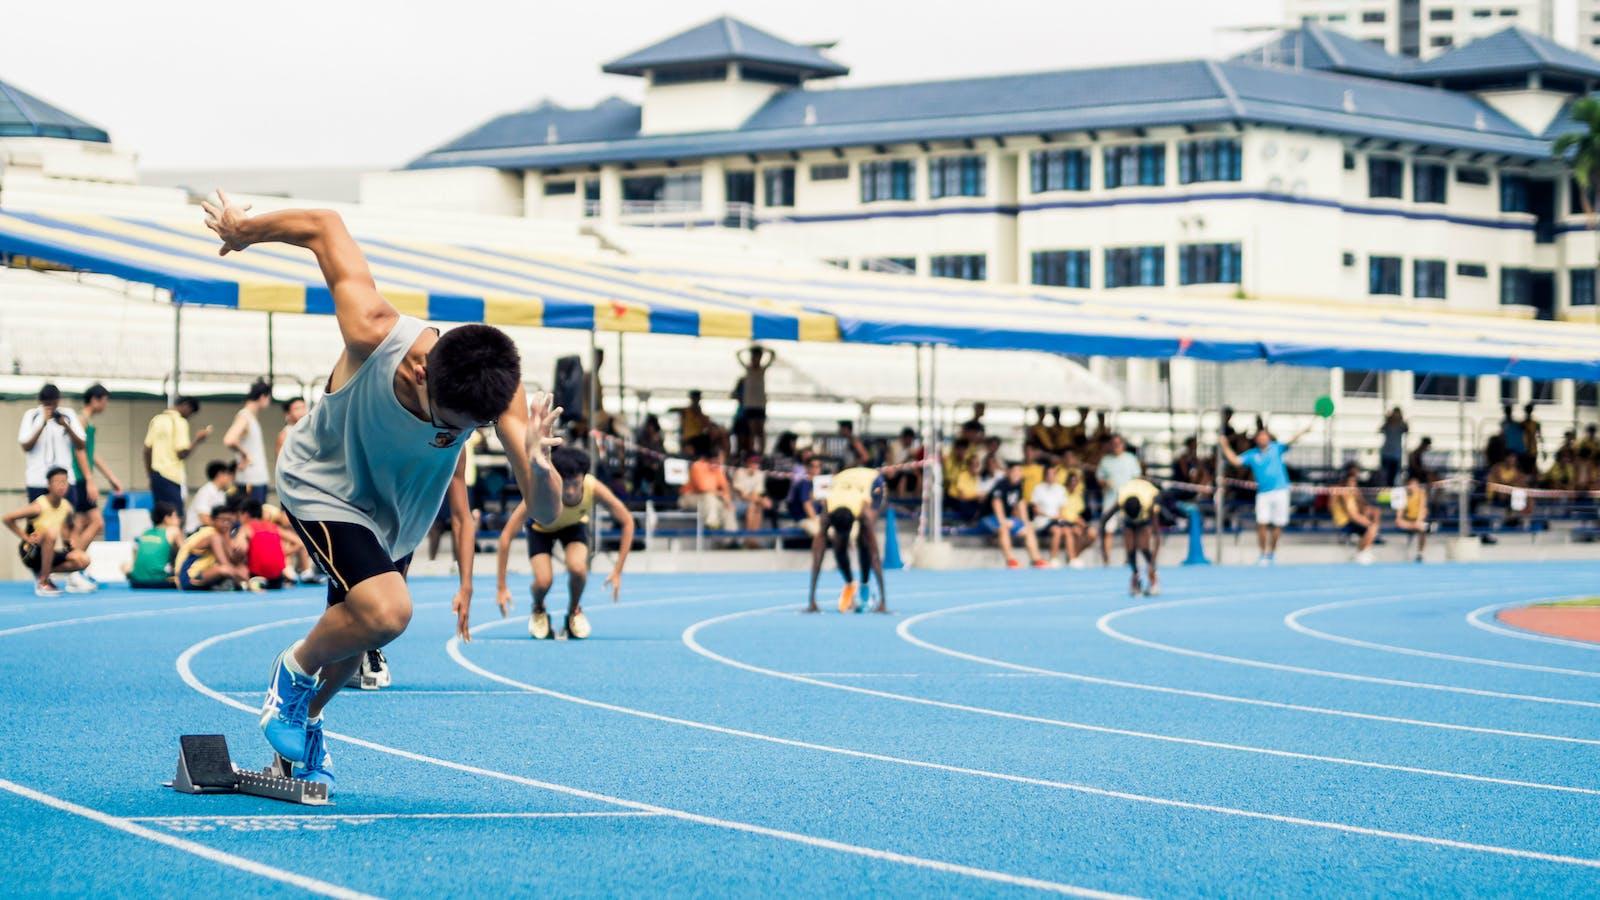 Run The Race To Finish Desiring